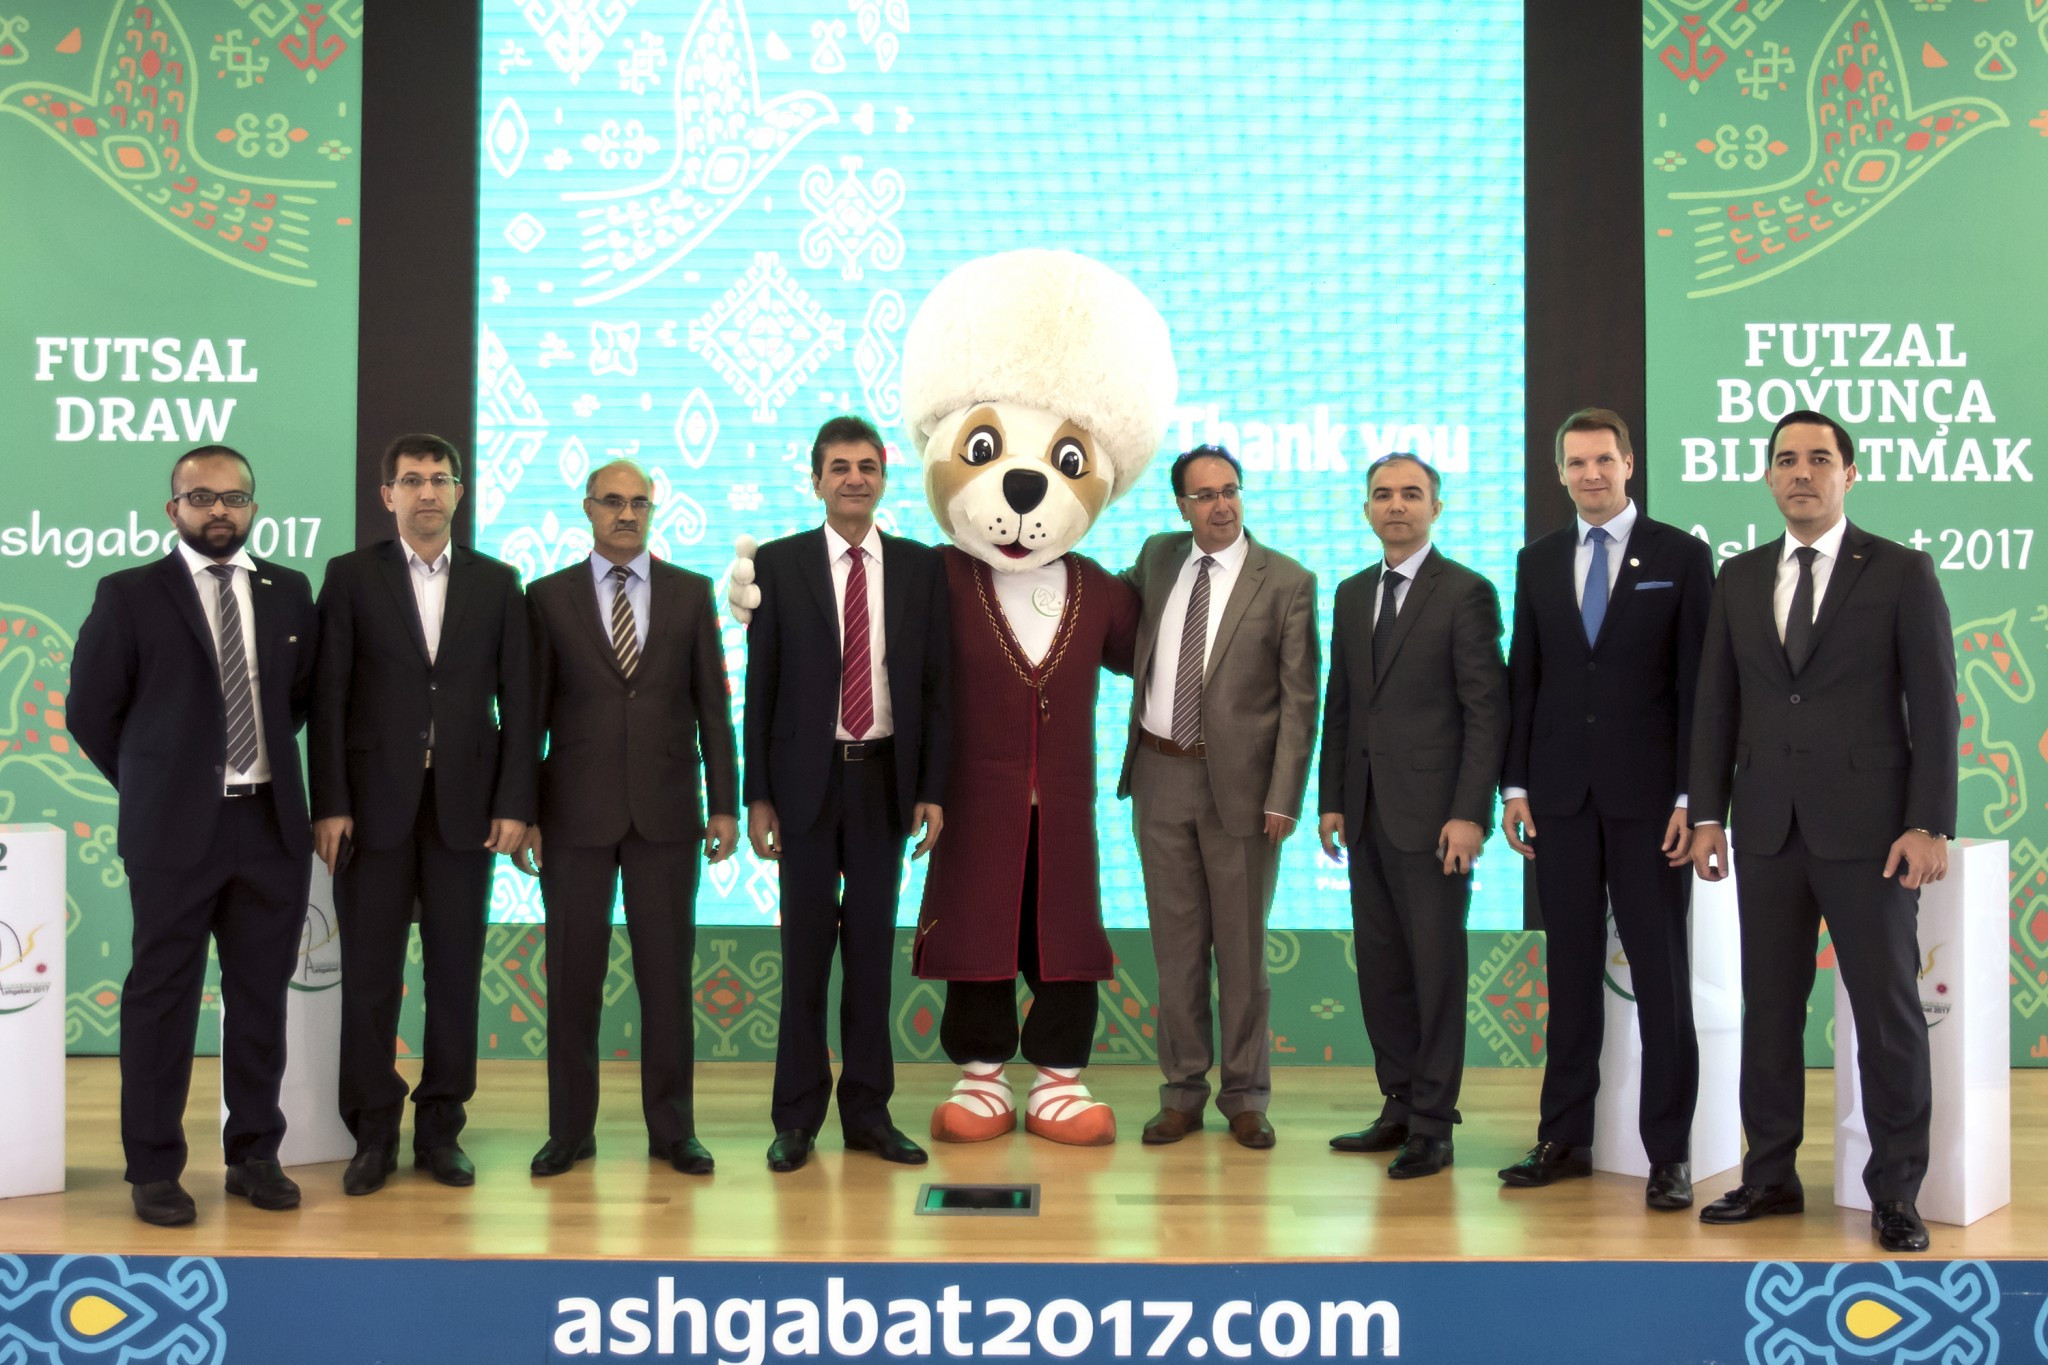 The draw was conducted at the Ashgabat 2017 headquarters ©Ashgabat 2017